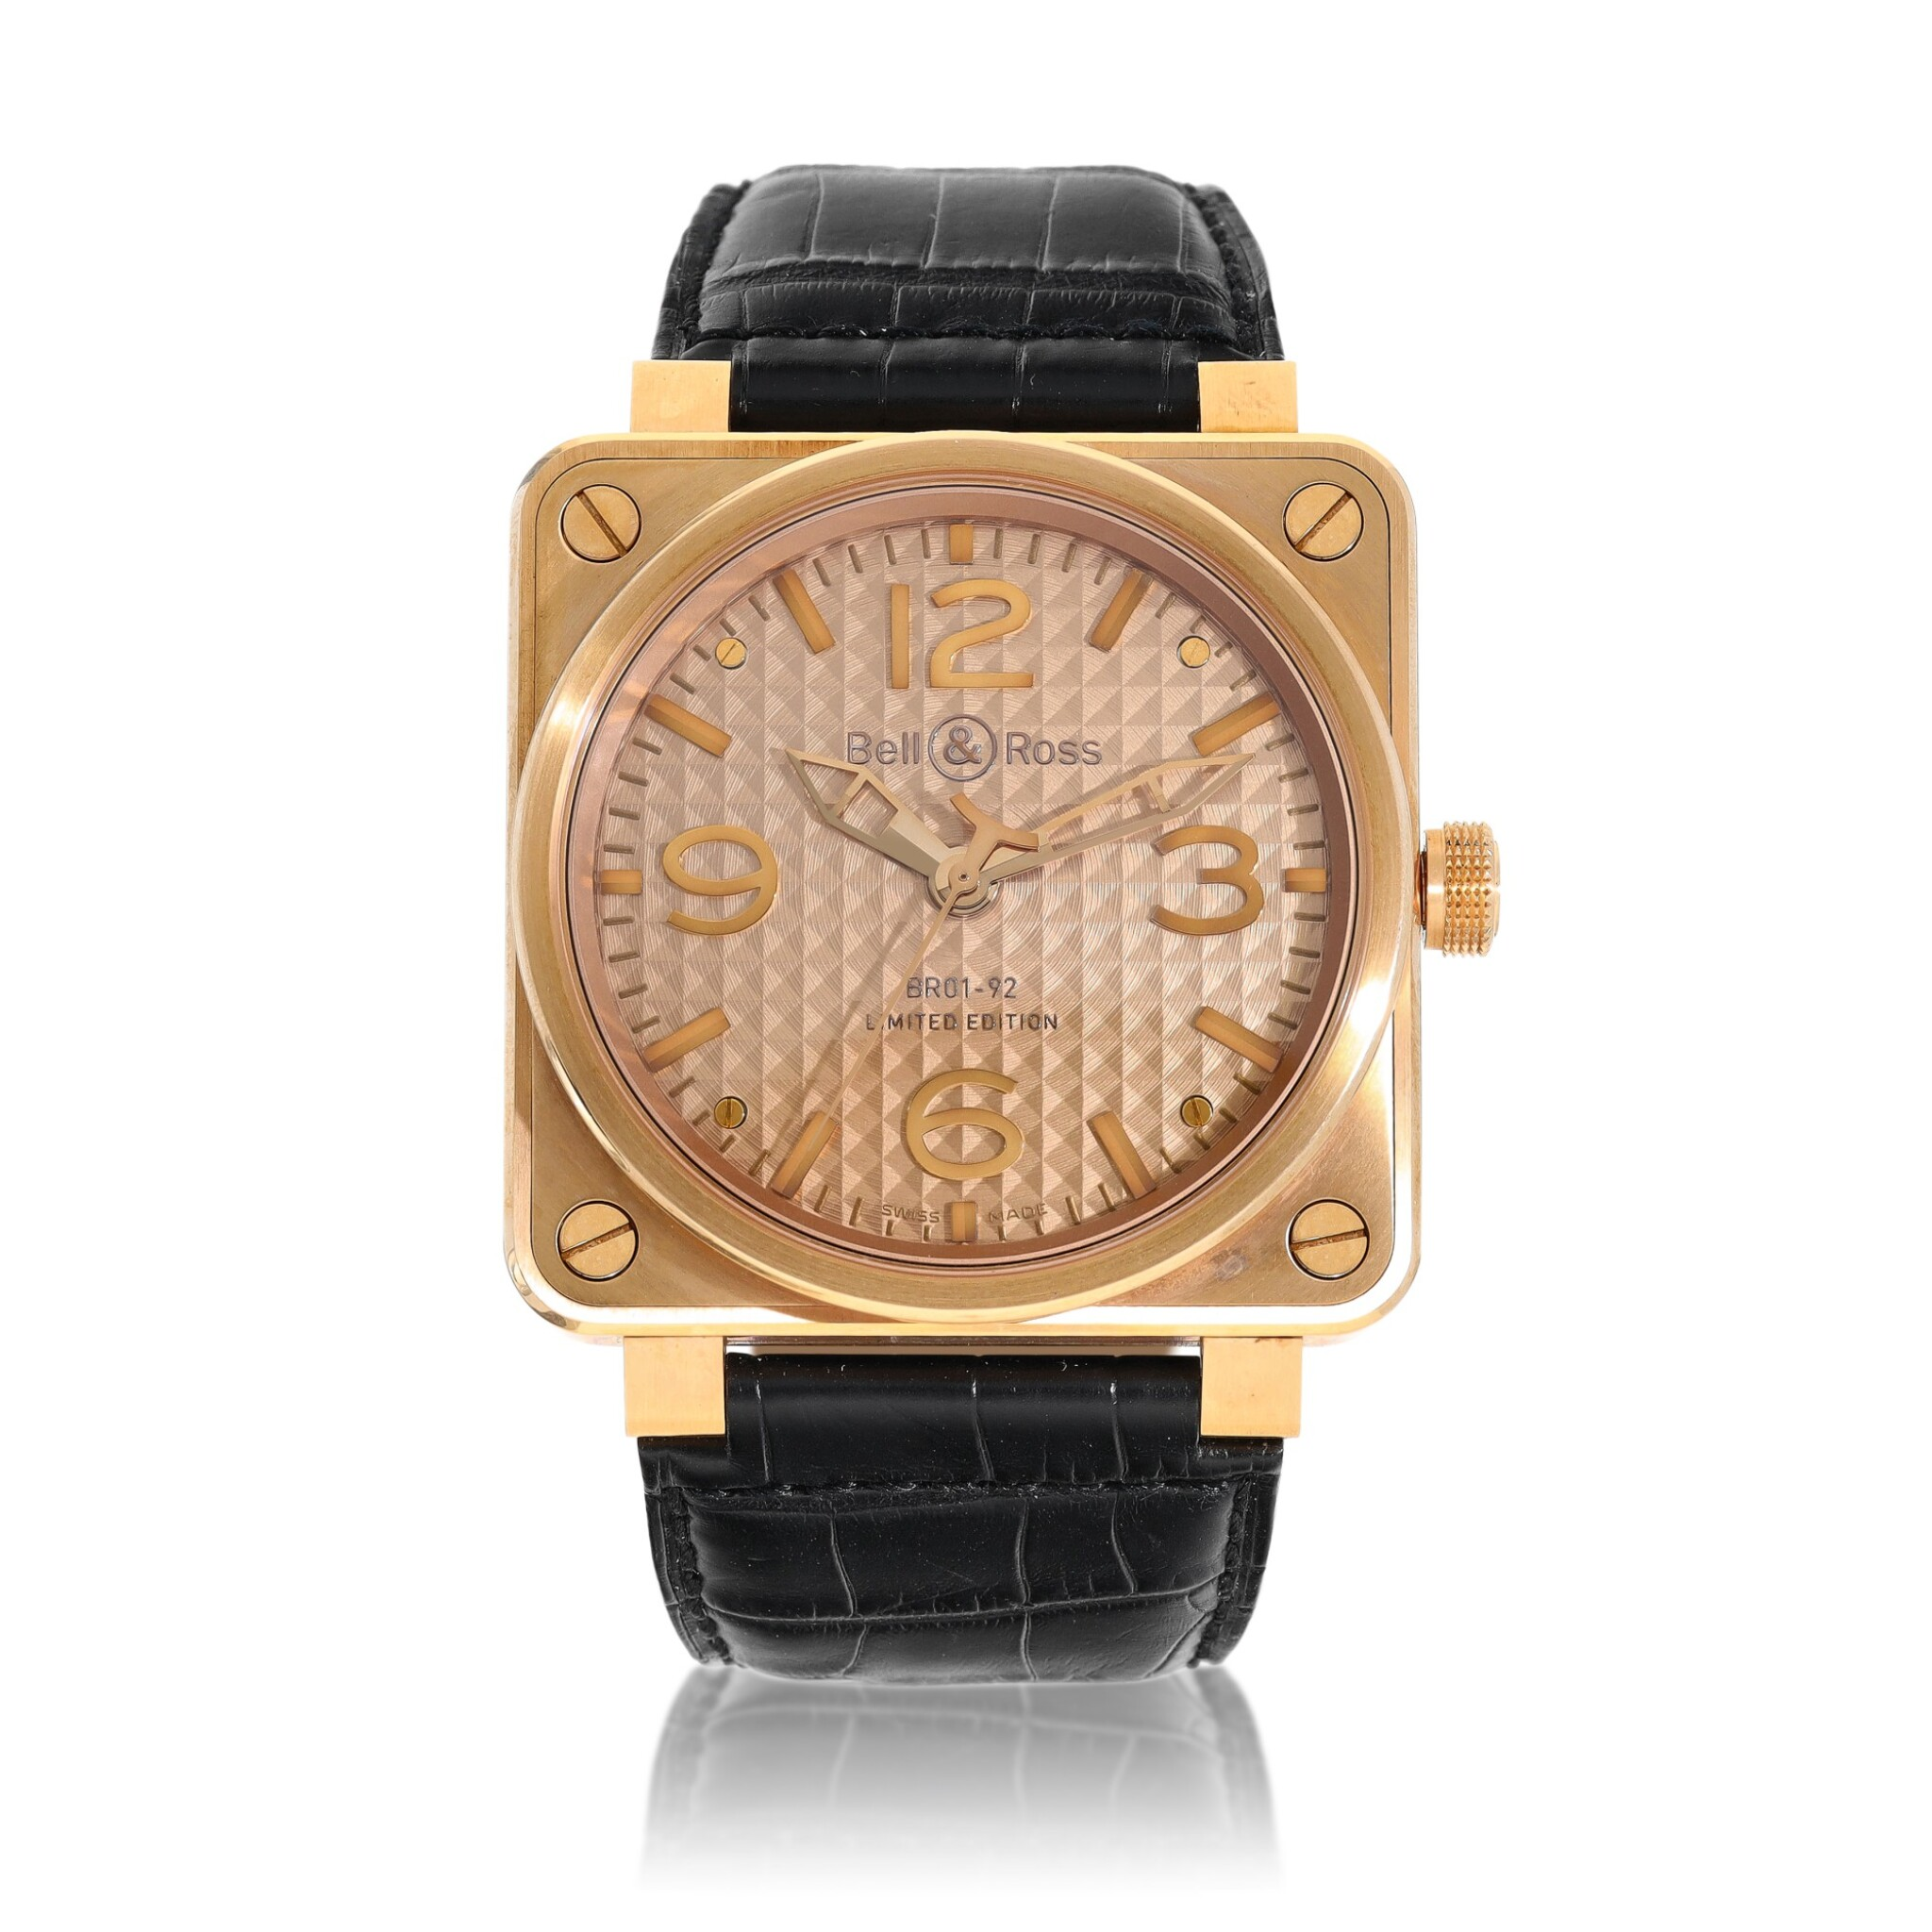 View full screen - View 1 of Lot 9315. Bell & Ross | Gold Ingot, Reference BR01-92-R, A limited edition pink gold wristwatch, Circa 2015 | Gold Ingot 型號BR01-92-R   限量版粉紅金腕錶,約2015年製.